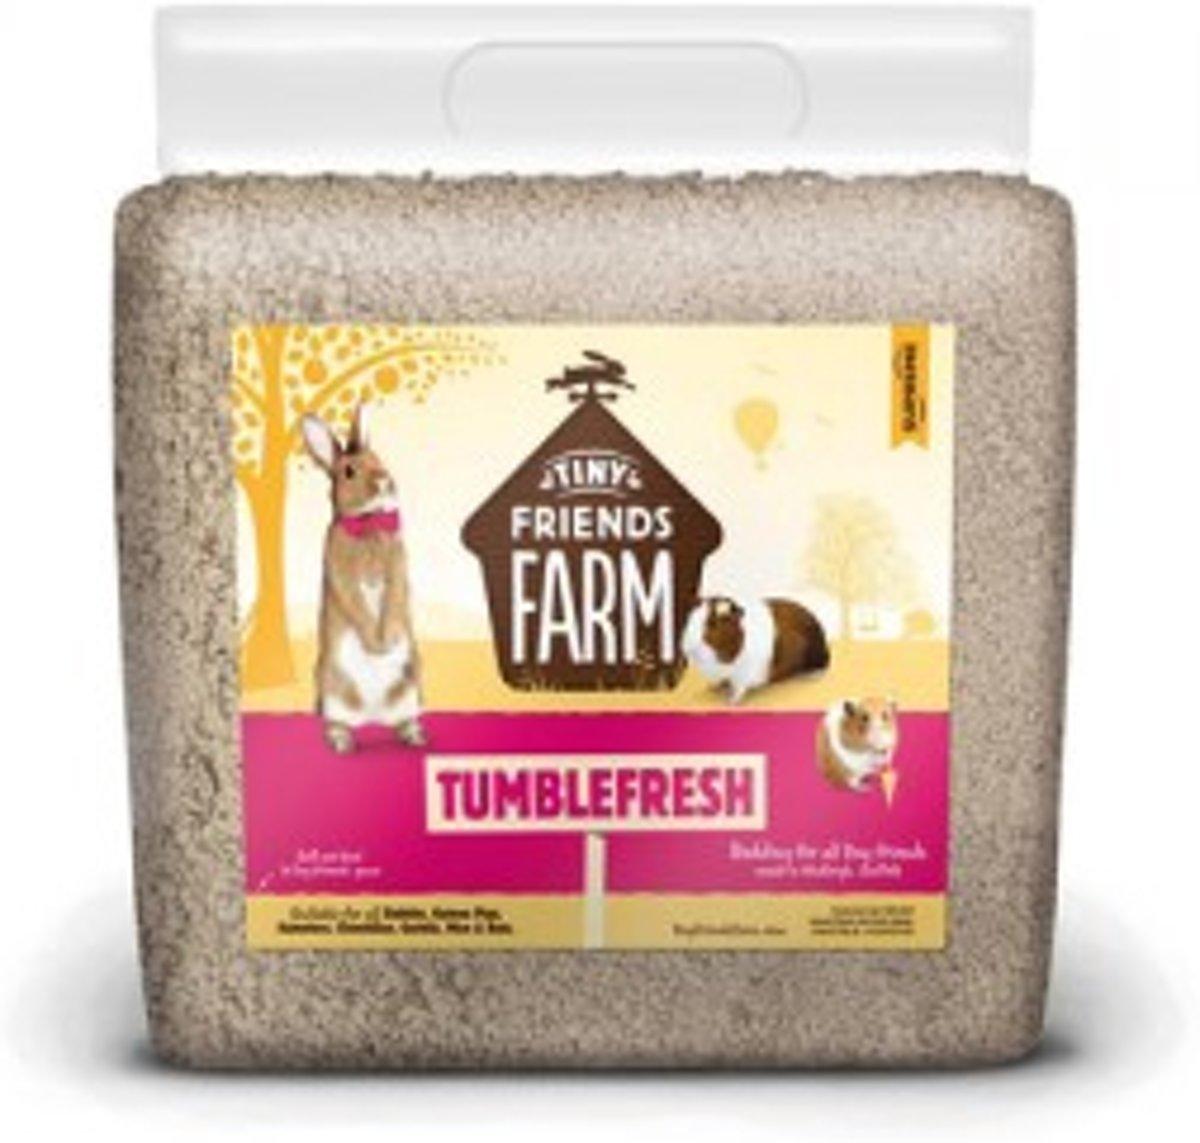 Supreme Tiny Friends Farm - Tumblefresh 17 l